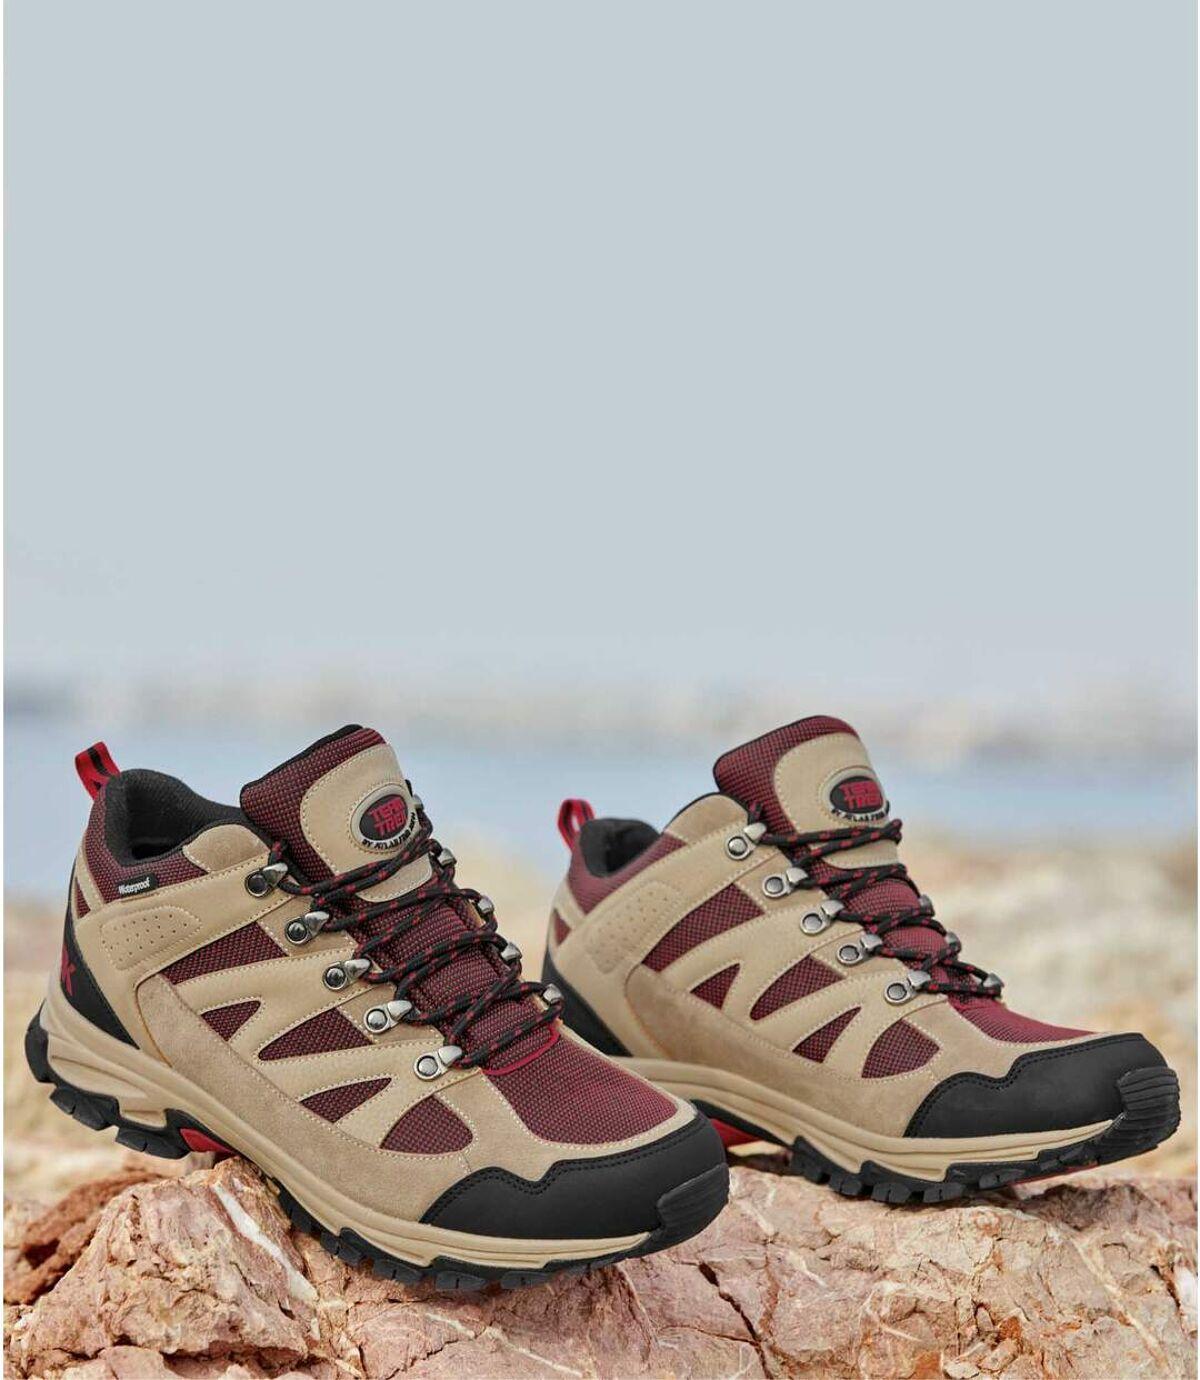 Stredne vysoké turistické topánky Atlas For Men